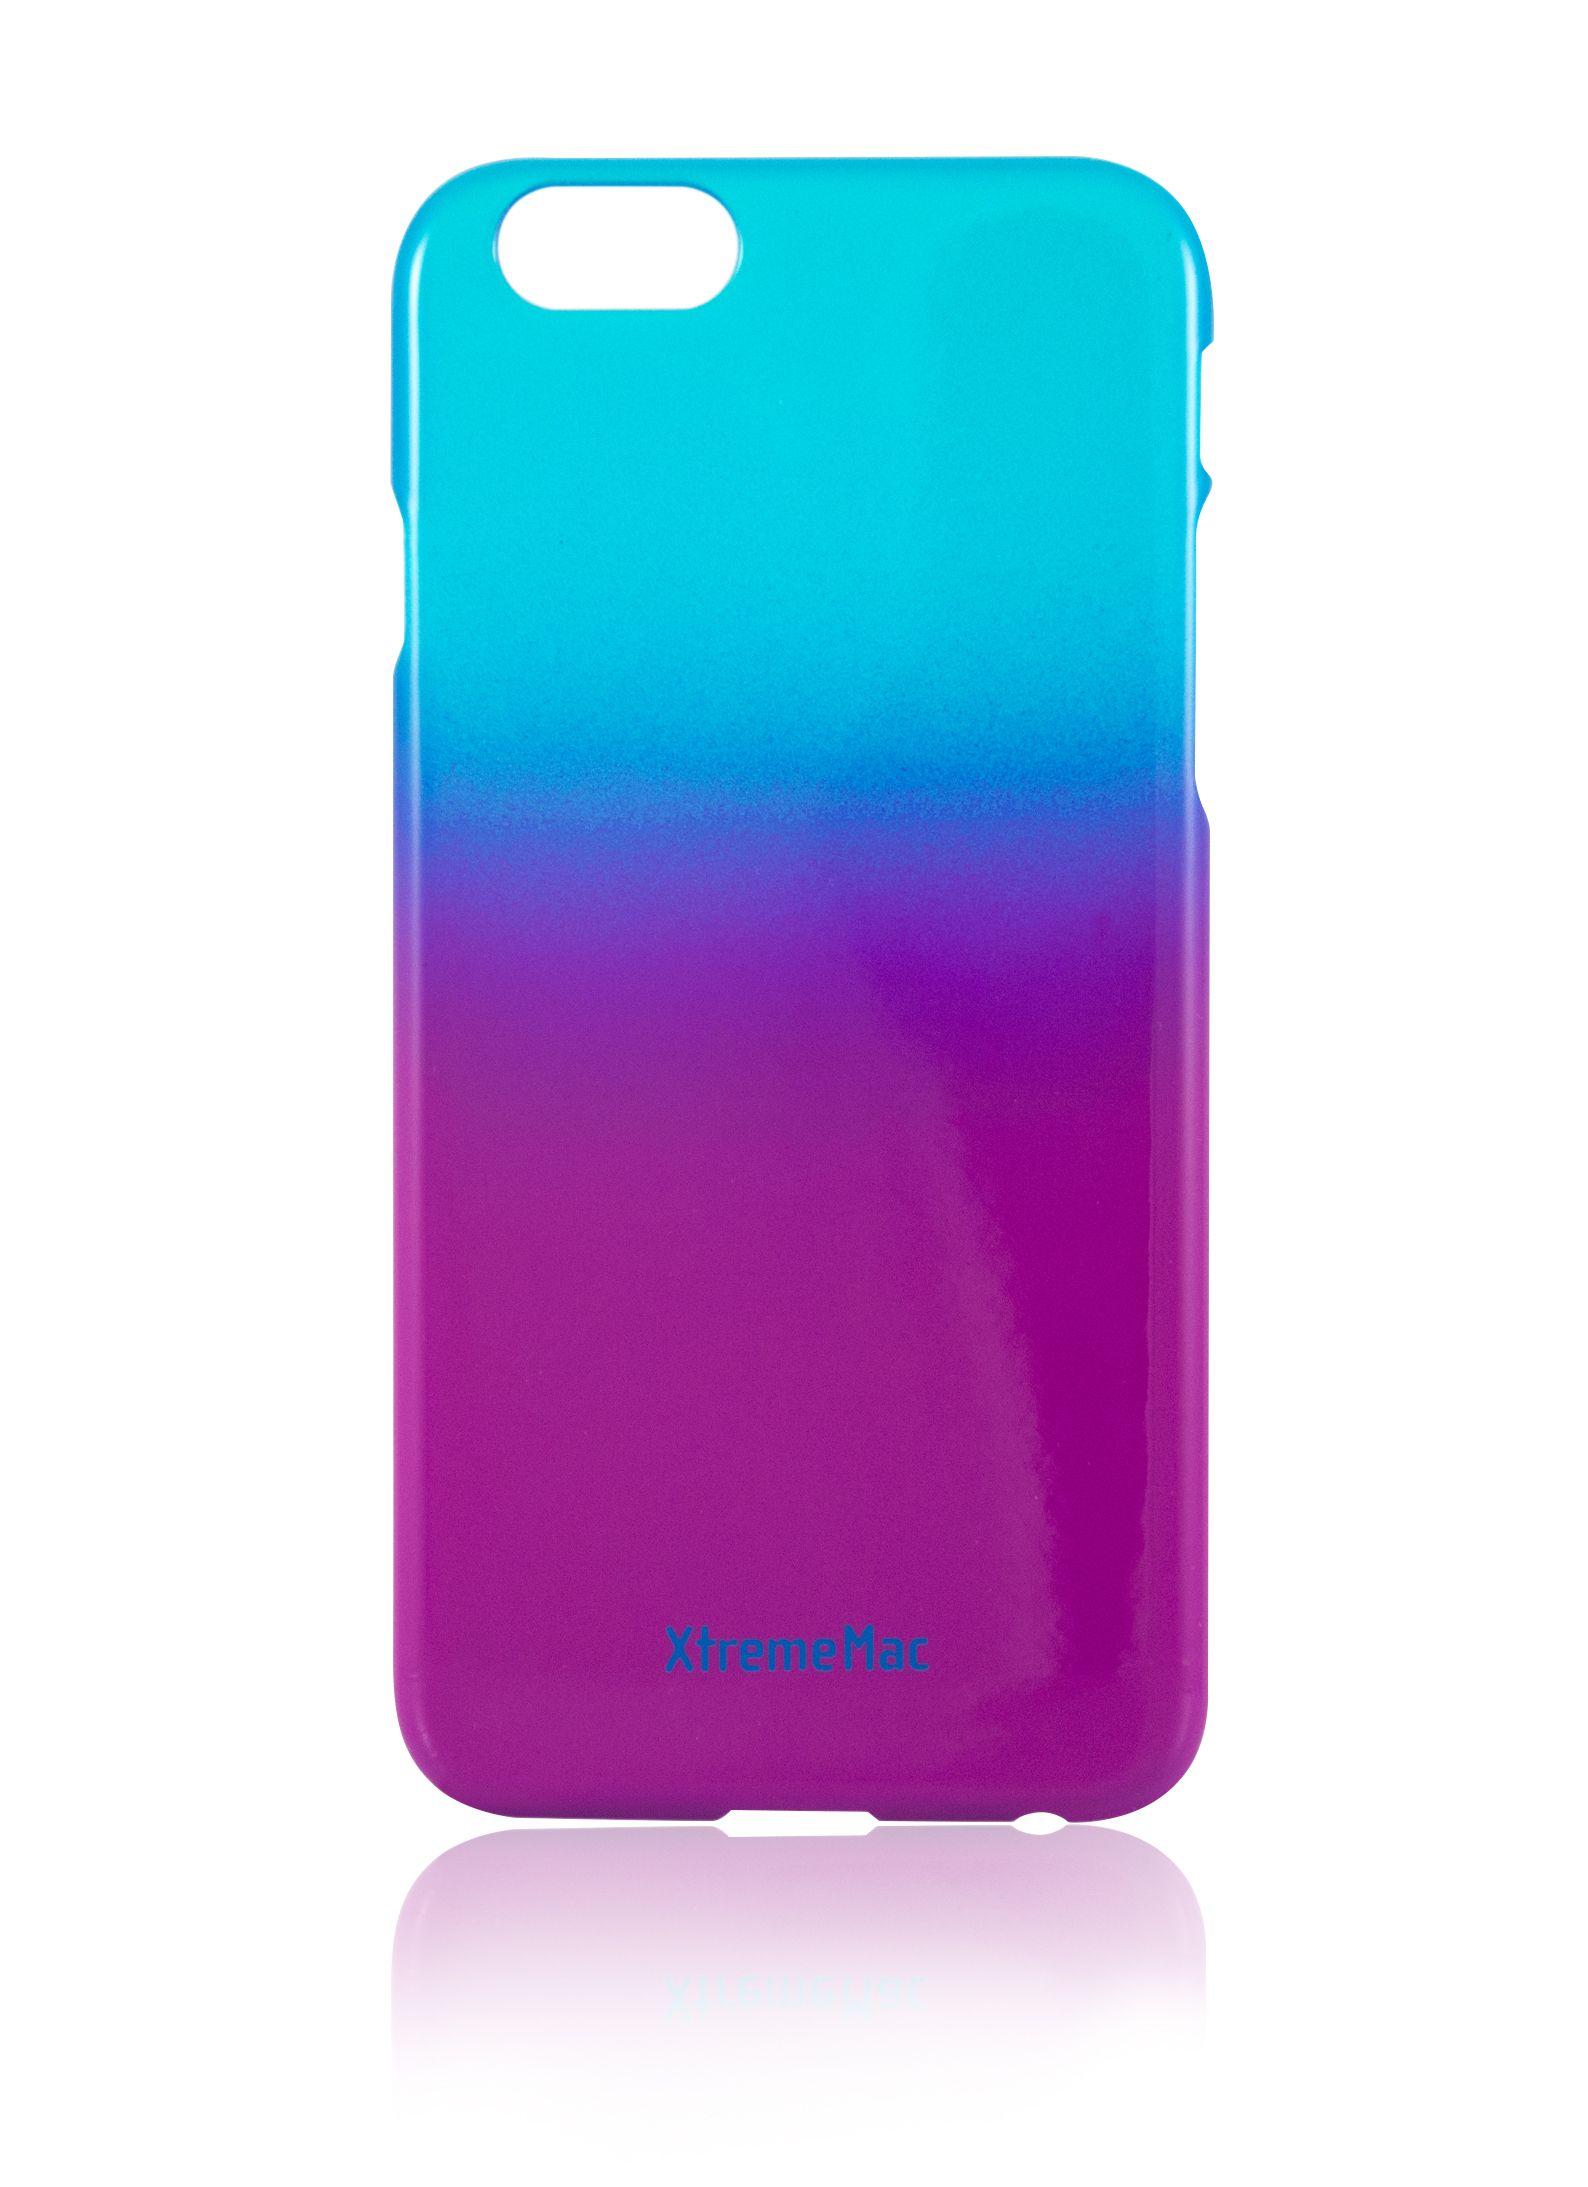 Калъф XtremeMac Microshield Fade - за iPhone 6, iPhone 6s, син/лилав - 1